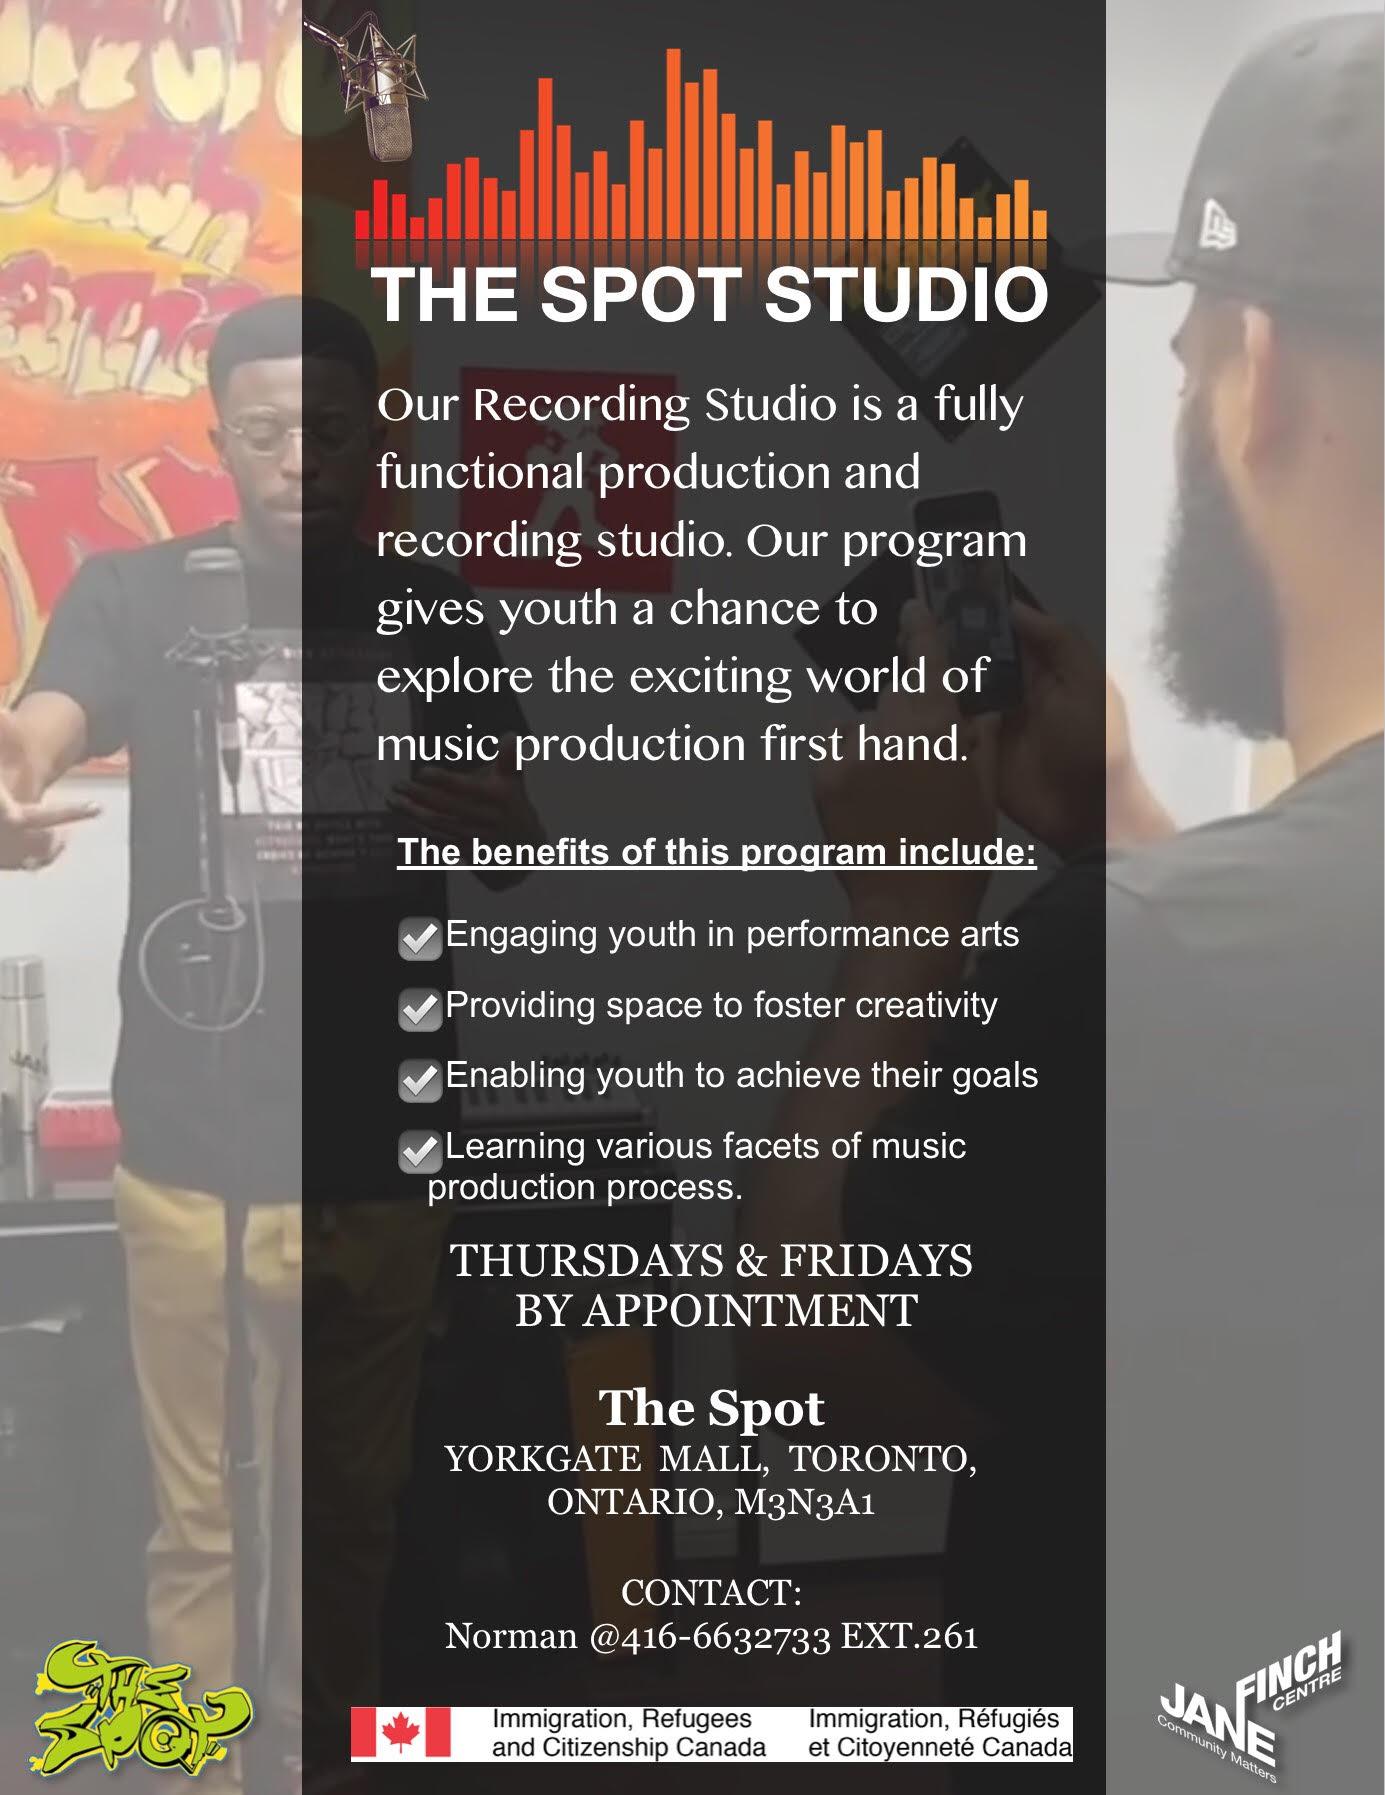 THE SPOT STUDIO.jpg